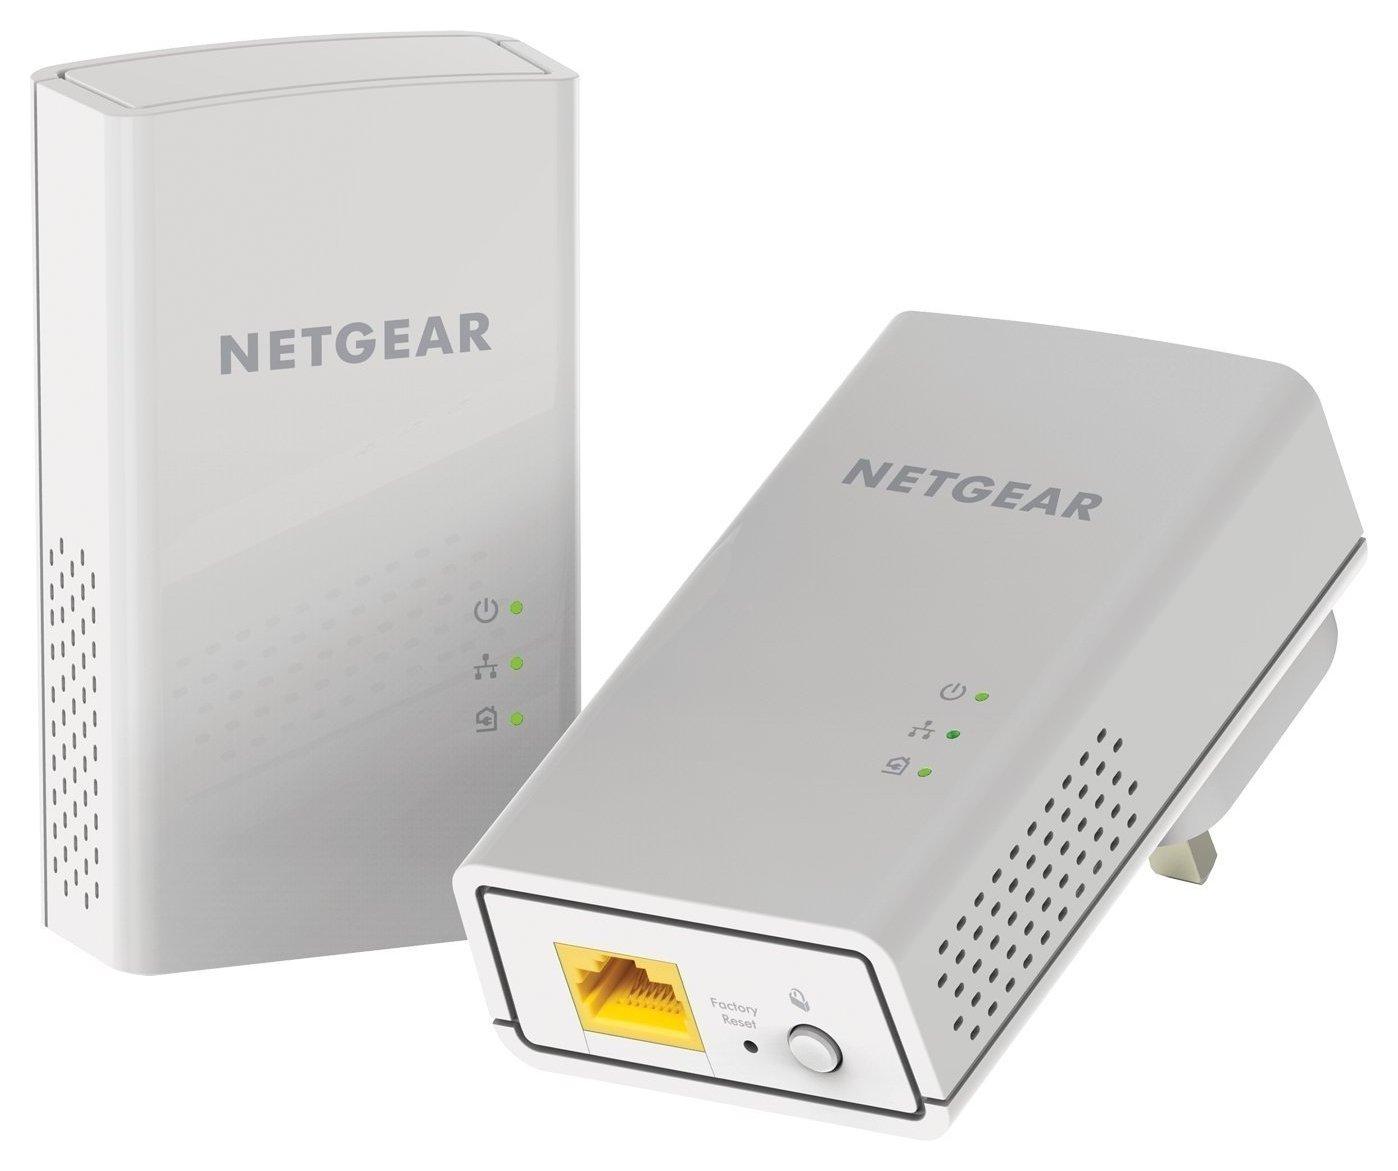 Netgear 1000Mbps Powerline Kit